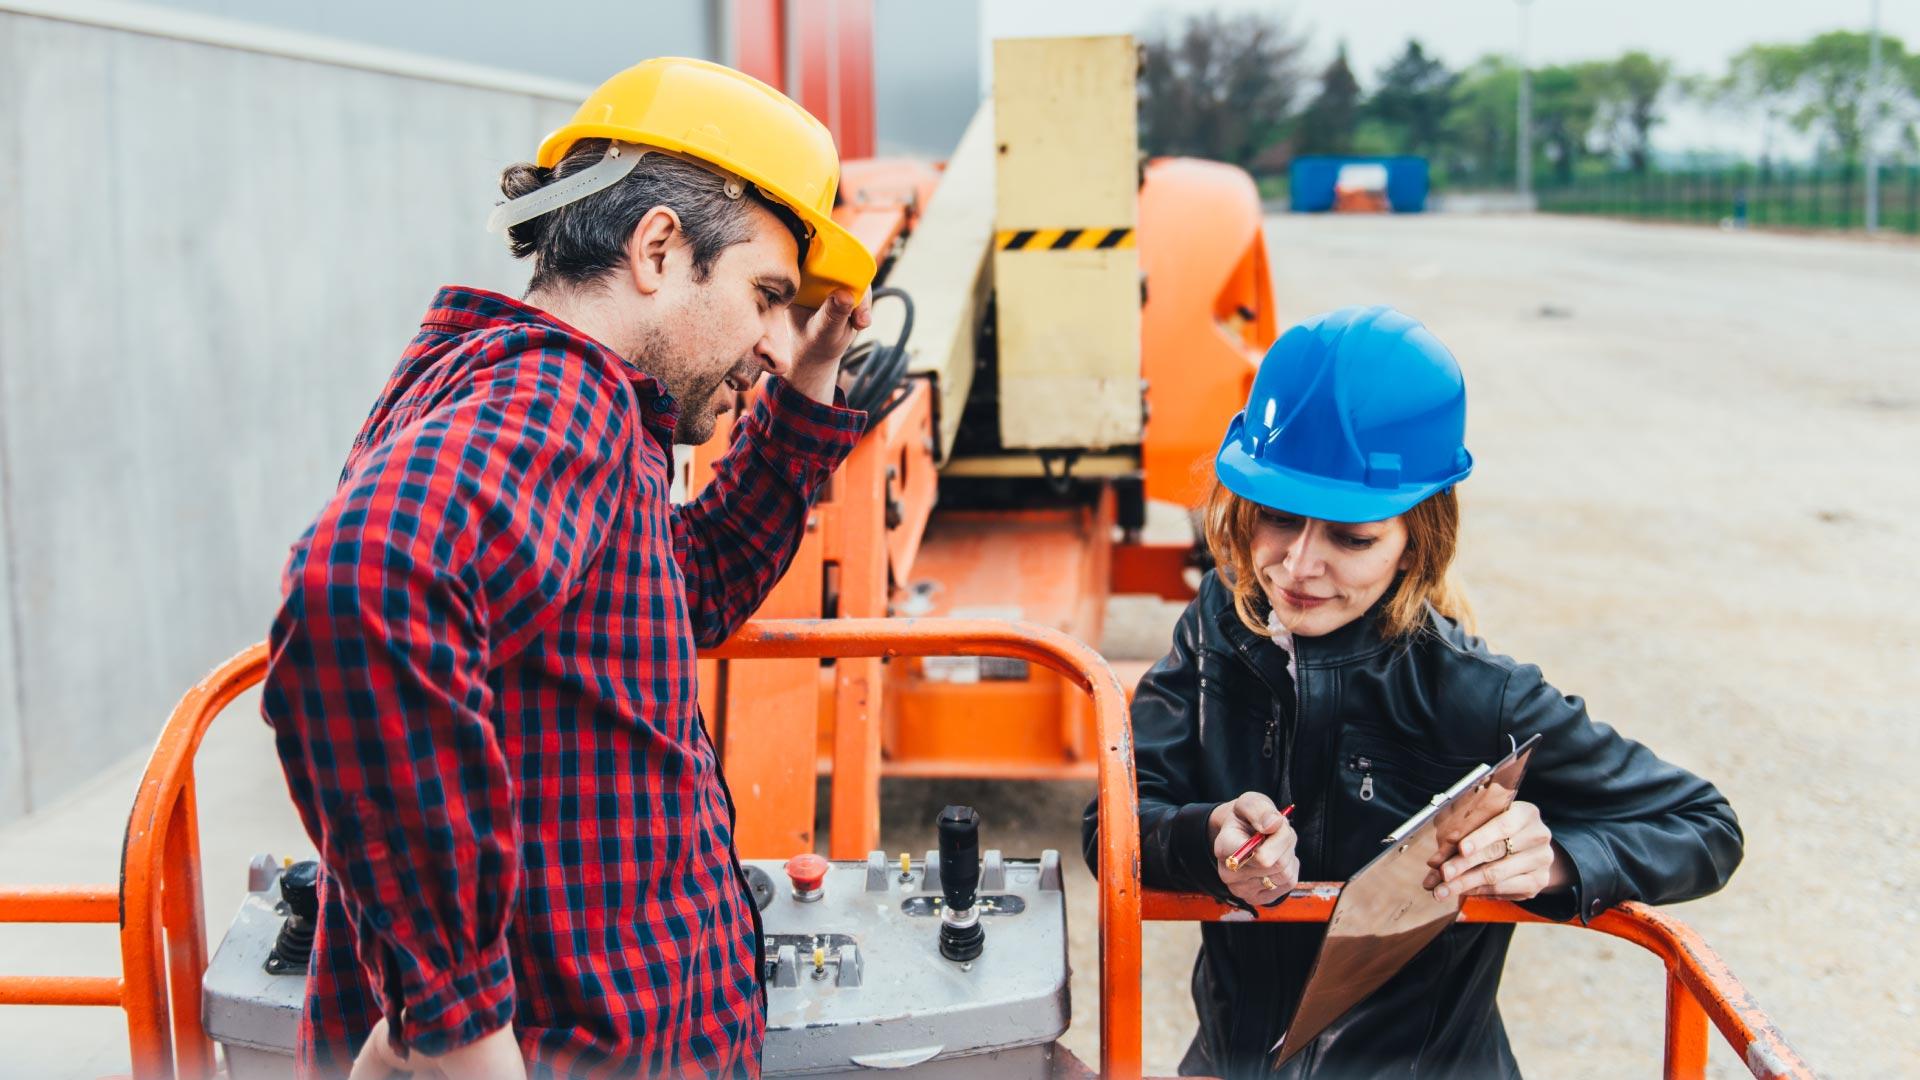 Explaining a document at a construction site